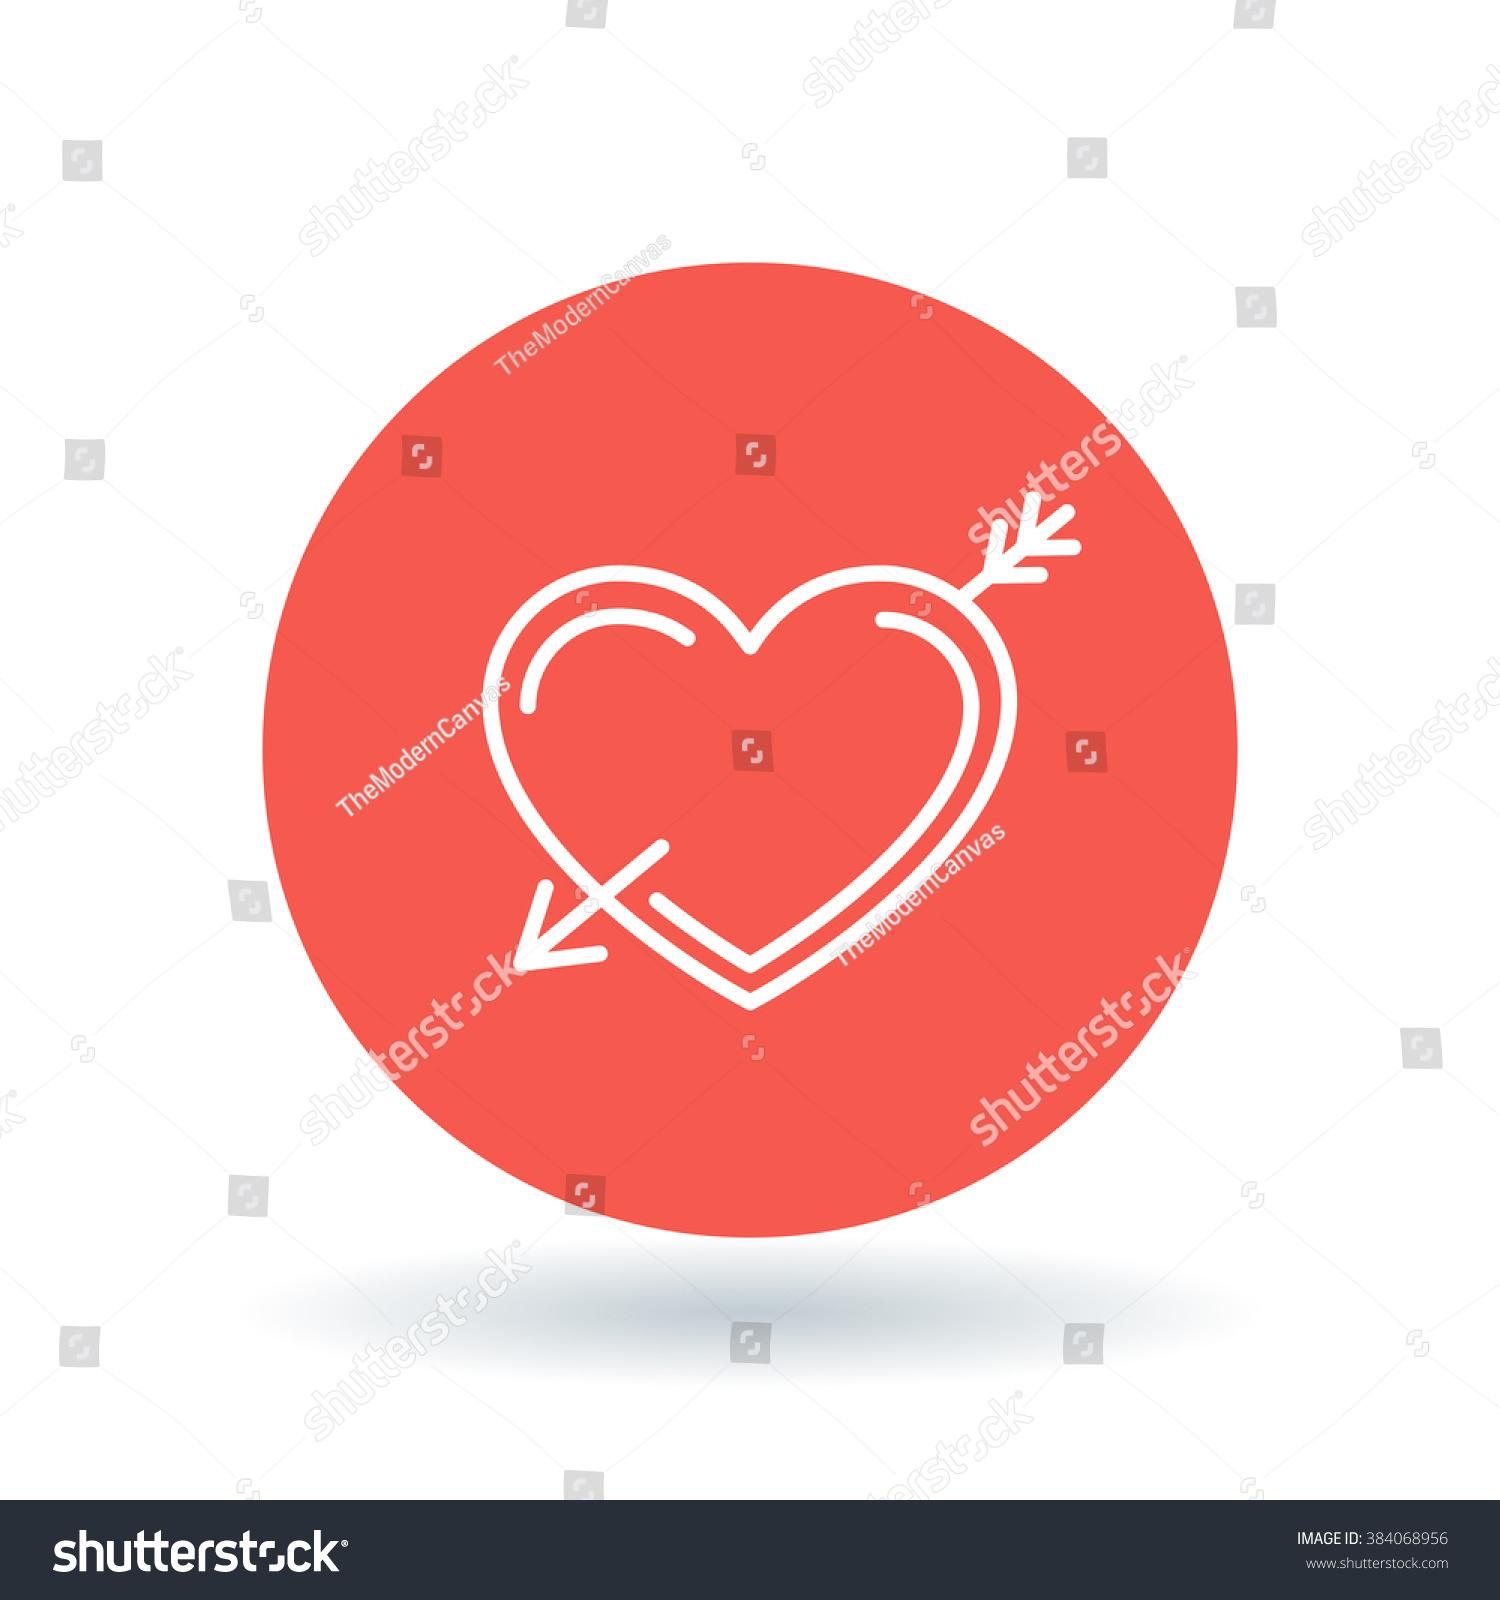 Arrow heart icon pierced heart sign stock vector 384068956 arrow heart icon pierced heart sign fall in love symbol white heart with buycottarizona